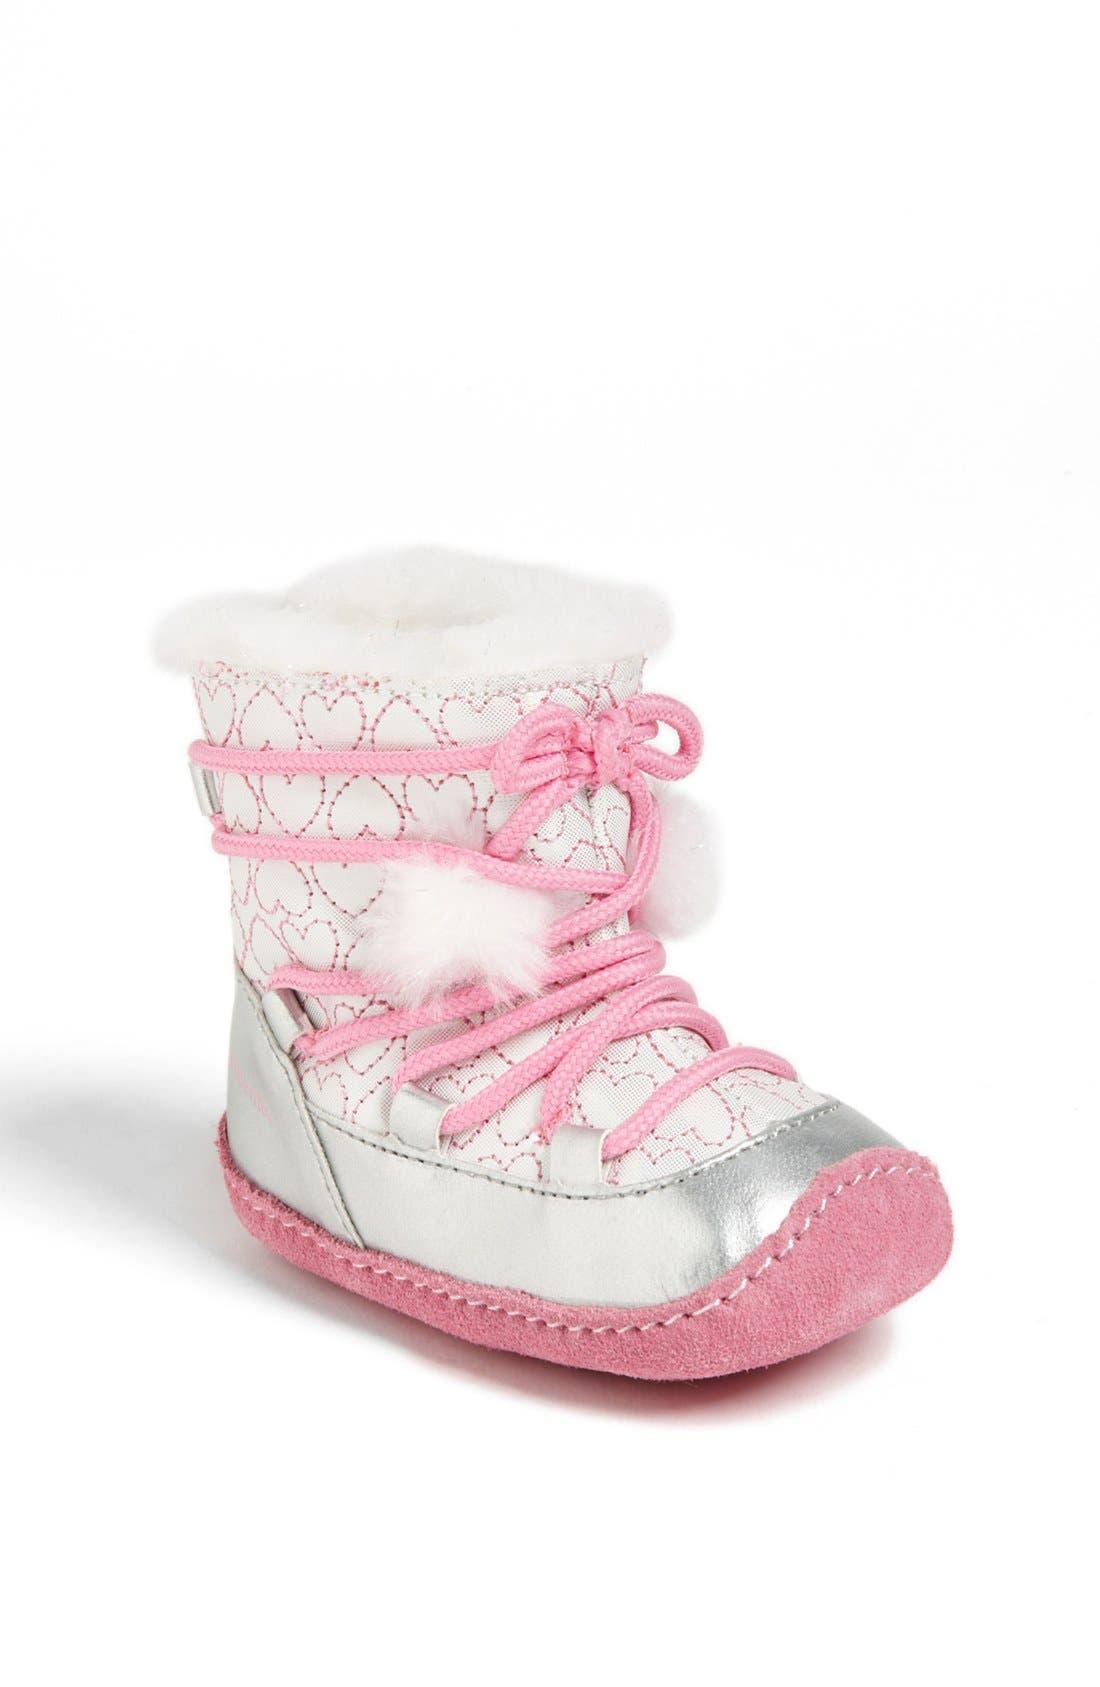 Alternate Image 1 Selected - Stride Rite 'Crawl - Snowdrop' Boot (Baby Girls)